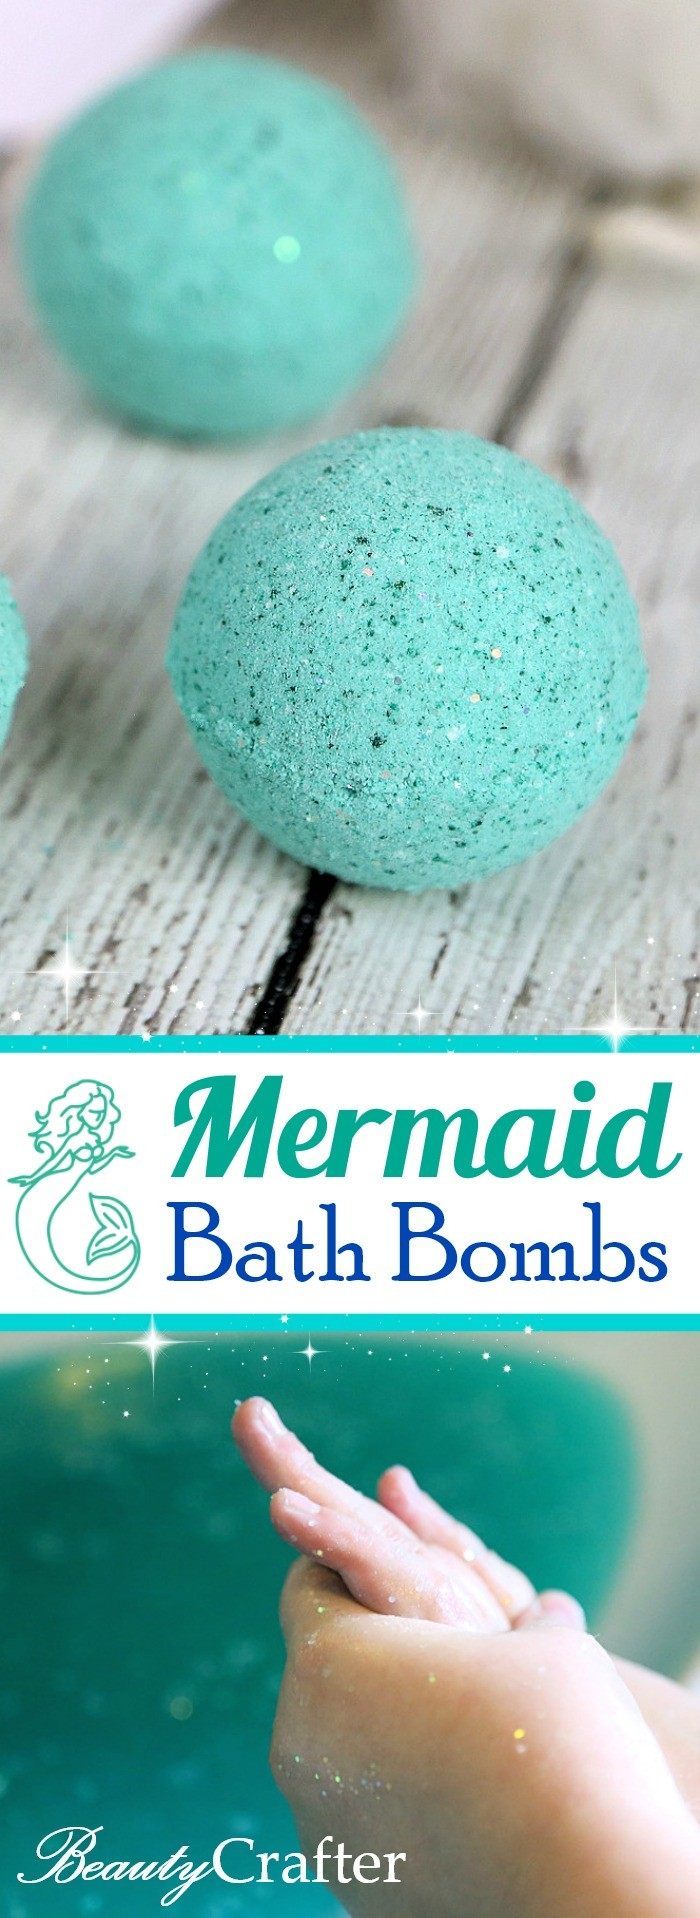 DIY Mermaid Bath Bombs : for a magical sparkling bath #bathbombs #mermaid #crafts #bathbomb